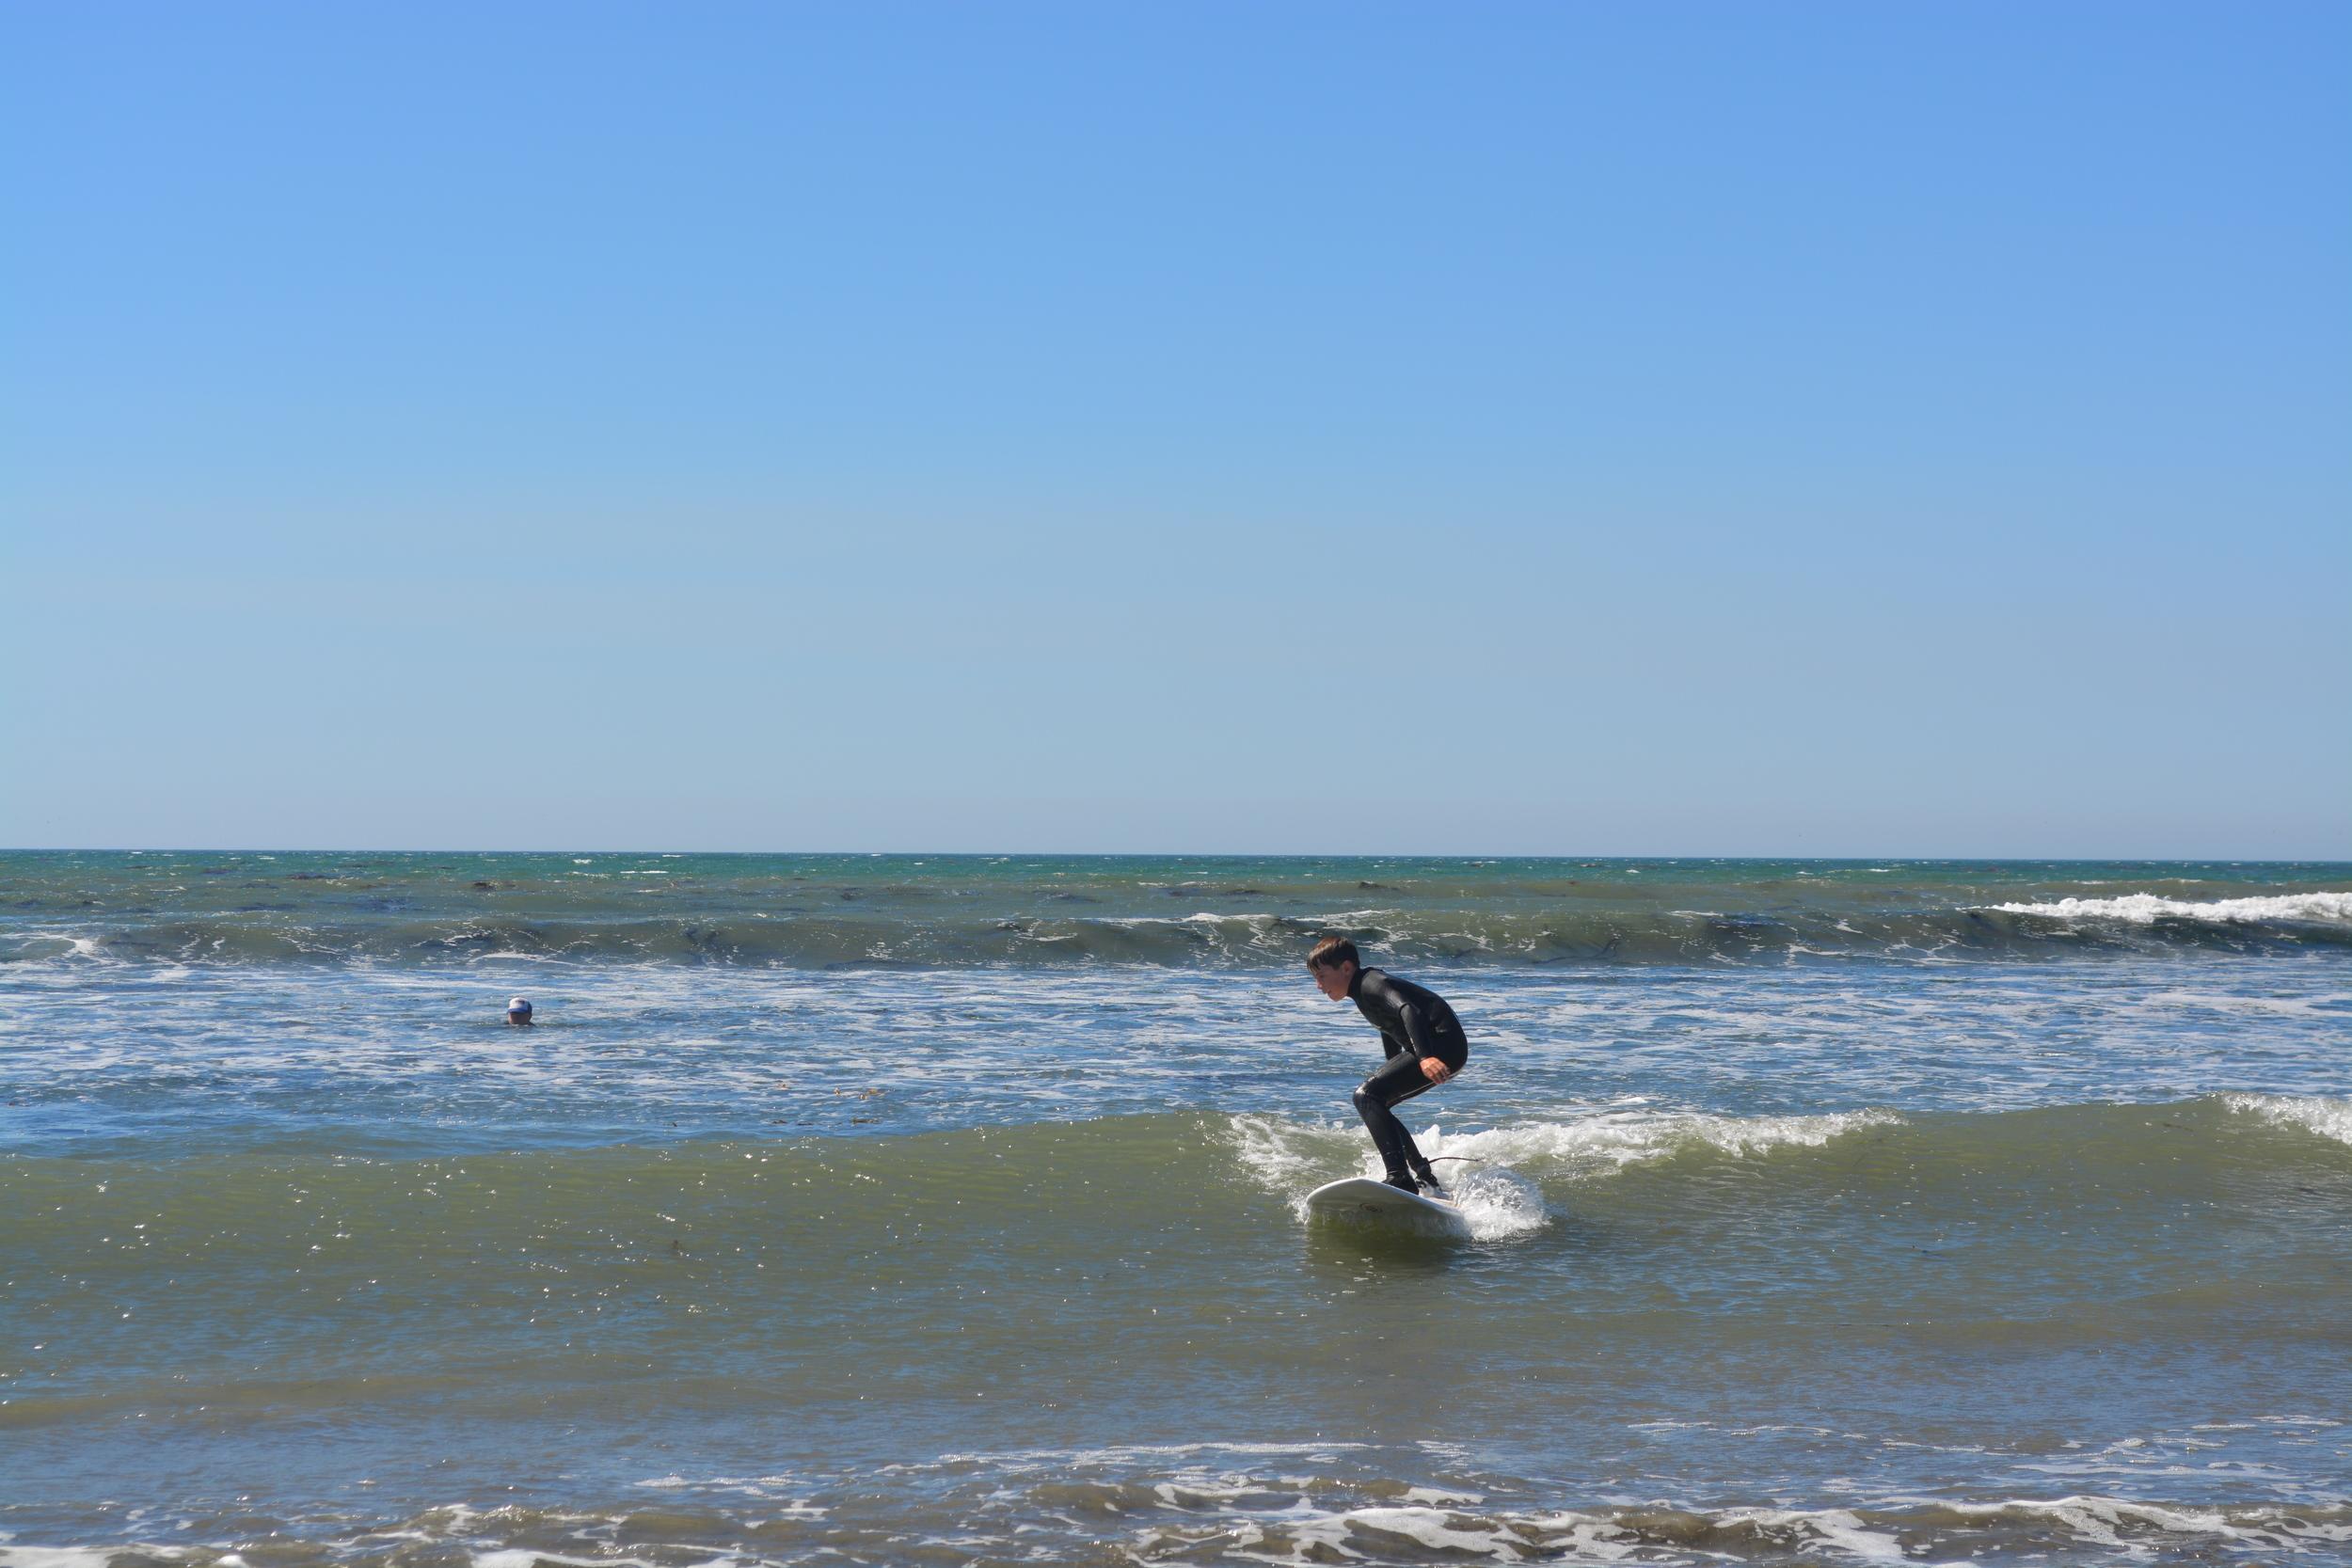 Baja California 10-5-13 Shipwrecks Surfing Adventure Ocean Experience Surf School San Diego (2).JPG